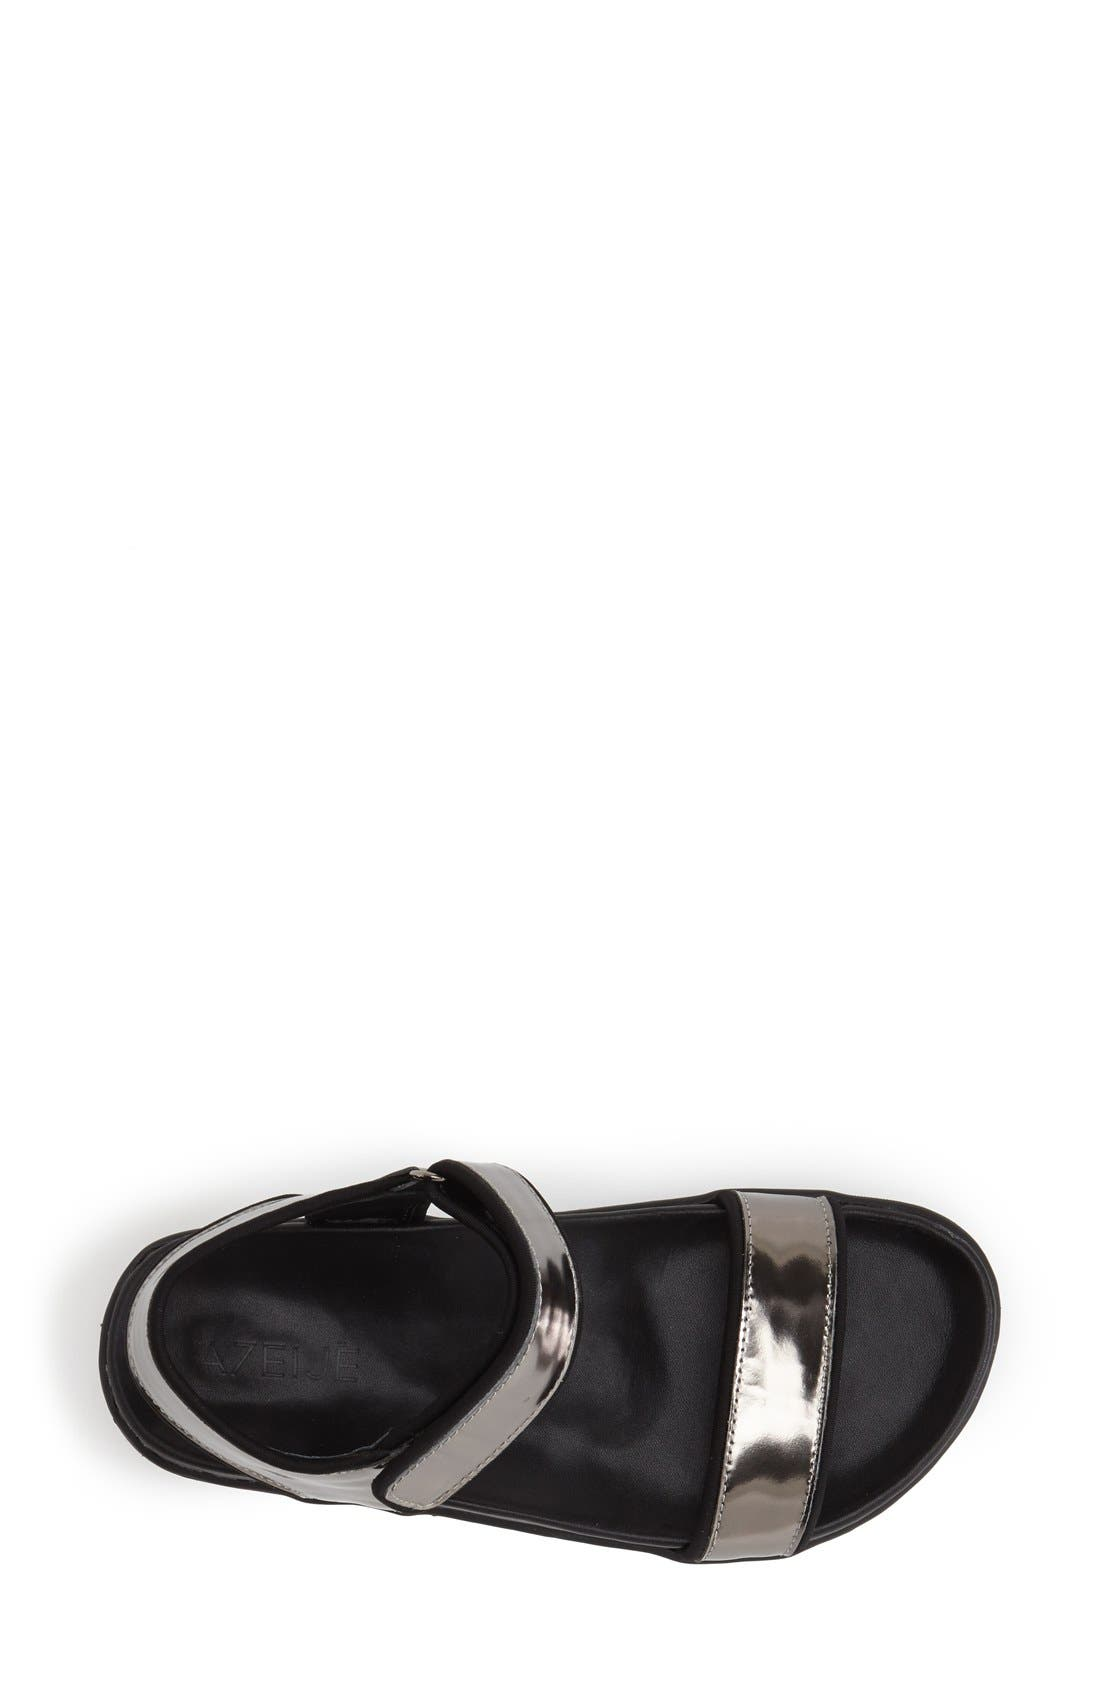 Alternate Image 3  - Ateljé 71 'Astra' Two Strap Sandal (Women)